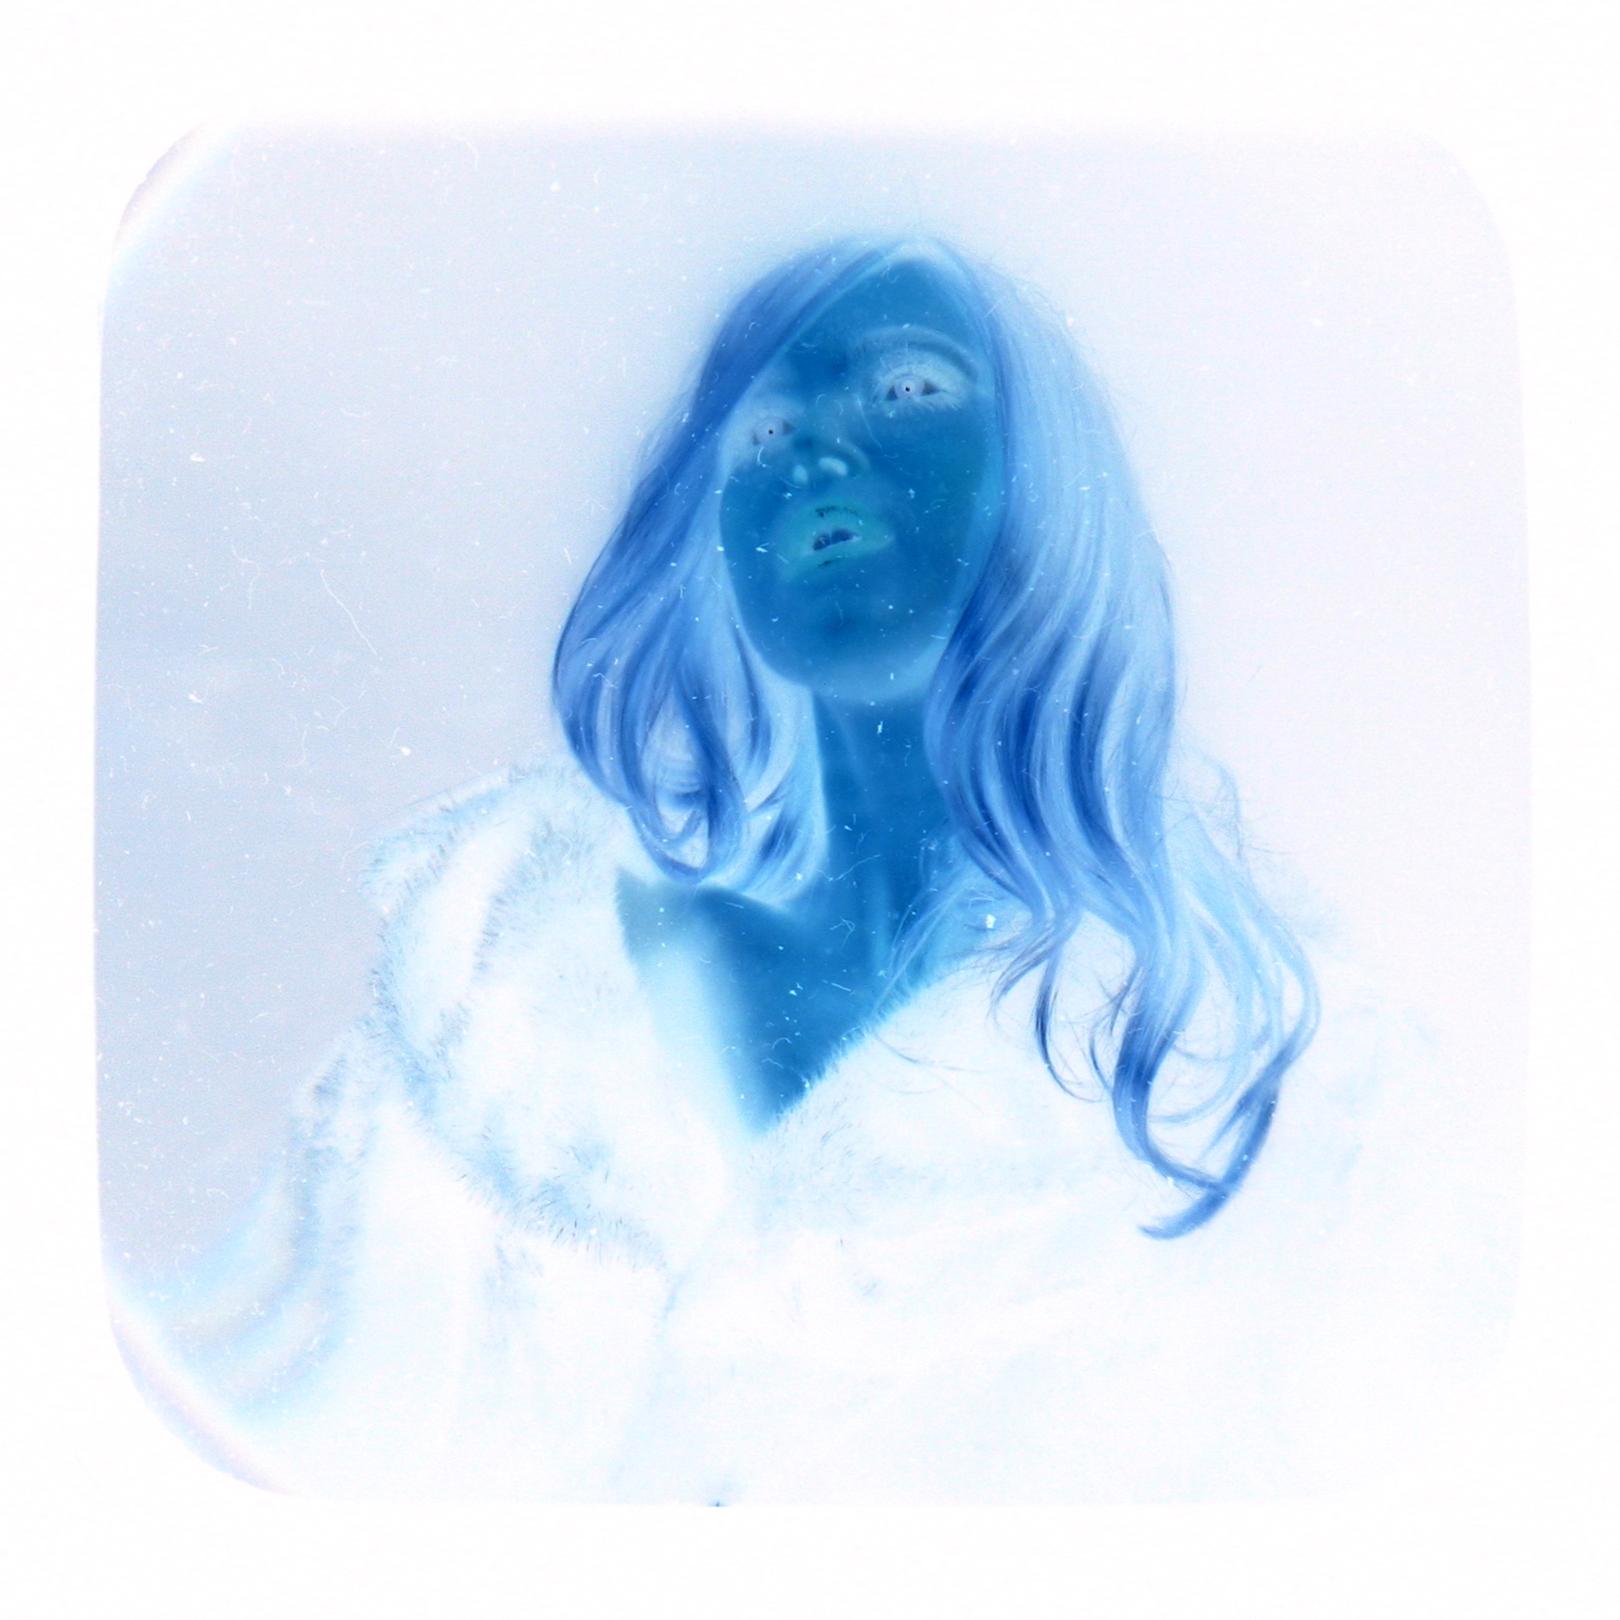 BLUE PRINT 20.jpg